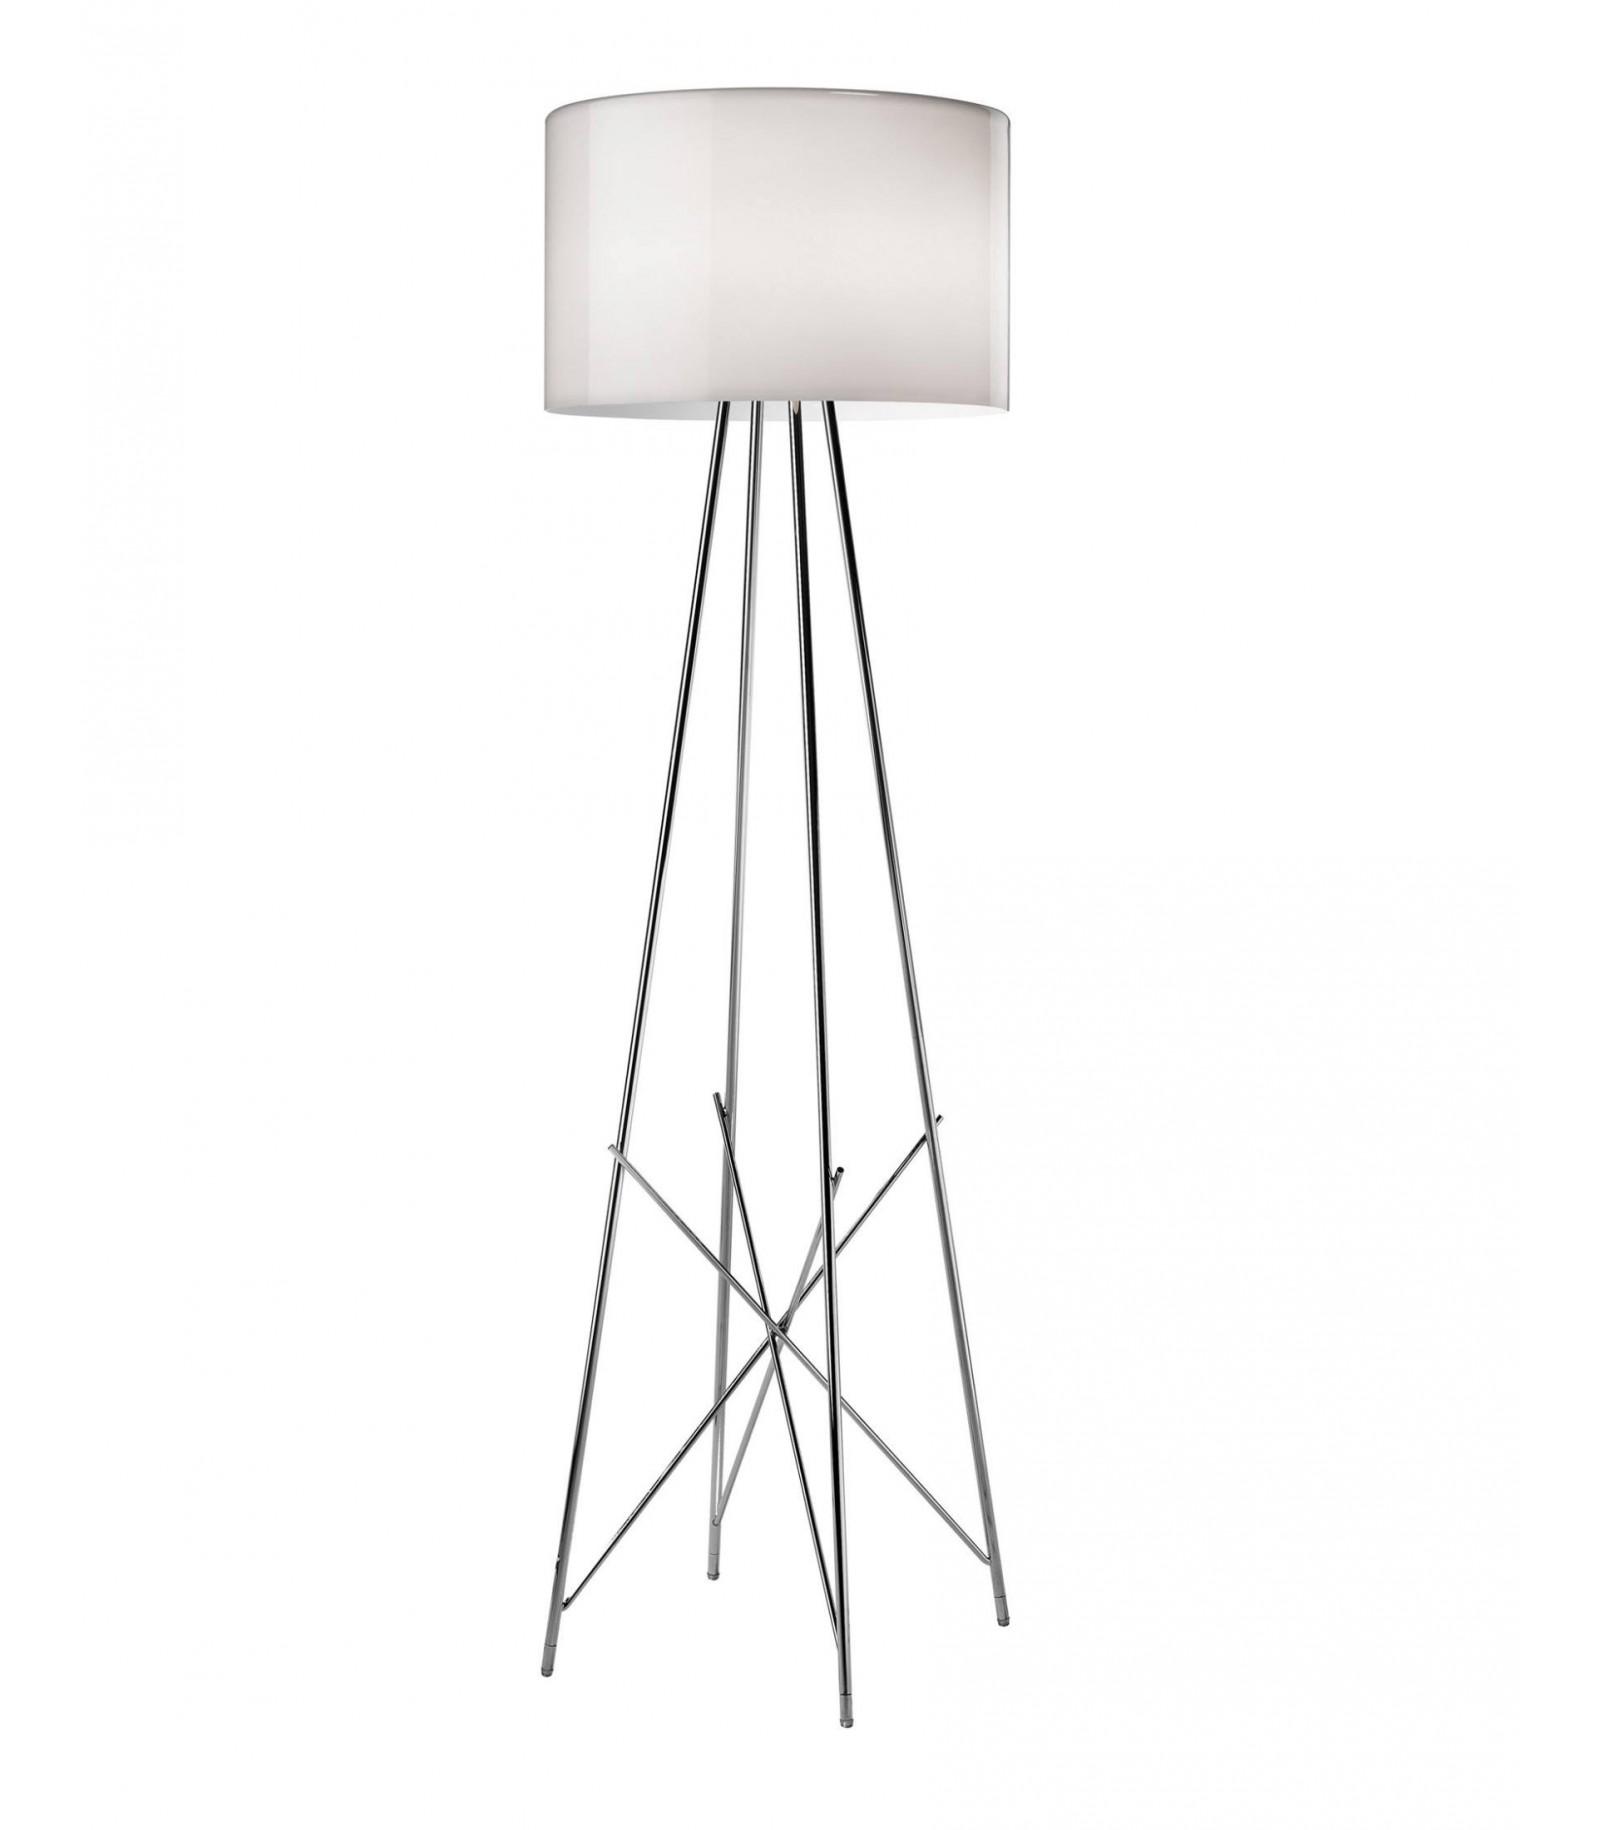 lampada da terra ray f1 di flos. Black Bedroom Furniture Sets. Home Design Ideas